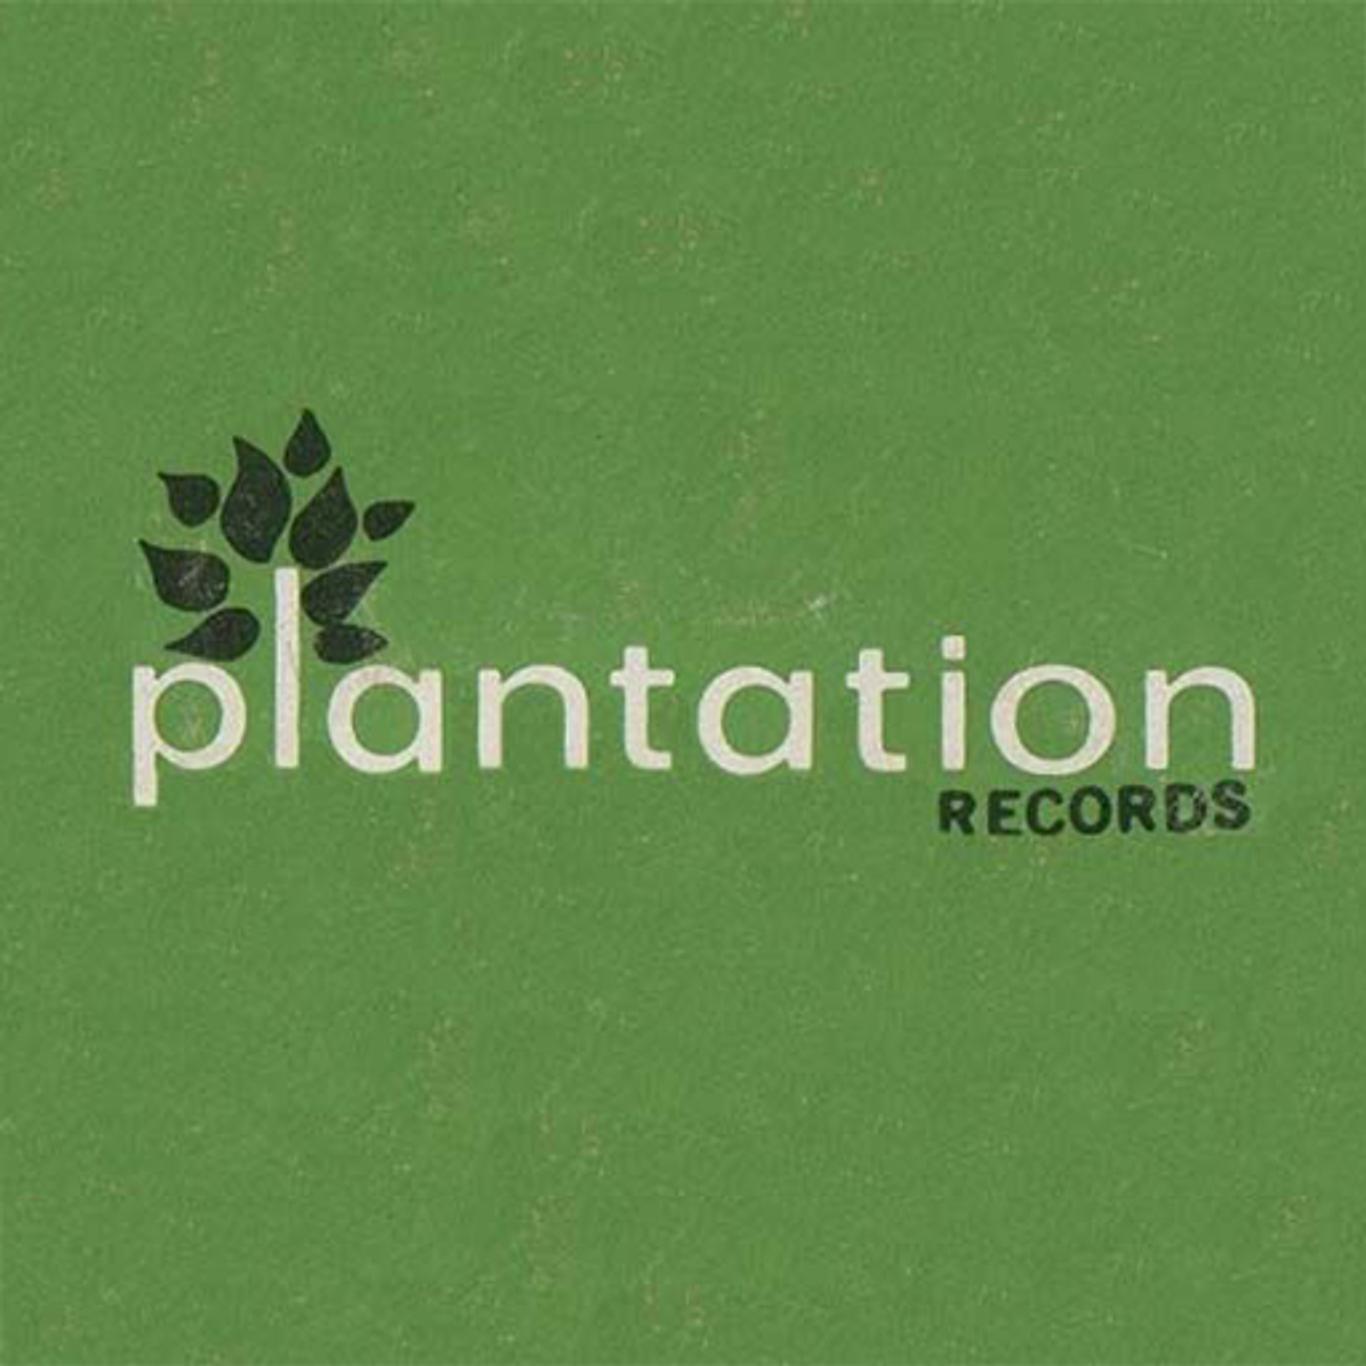 Plantation Records